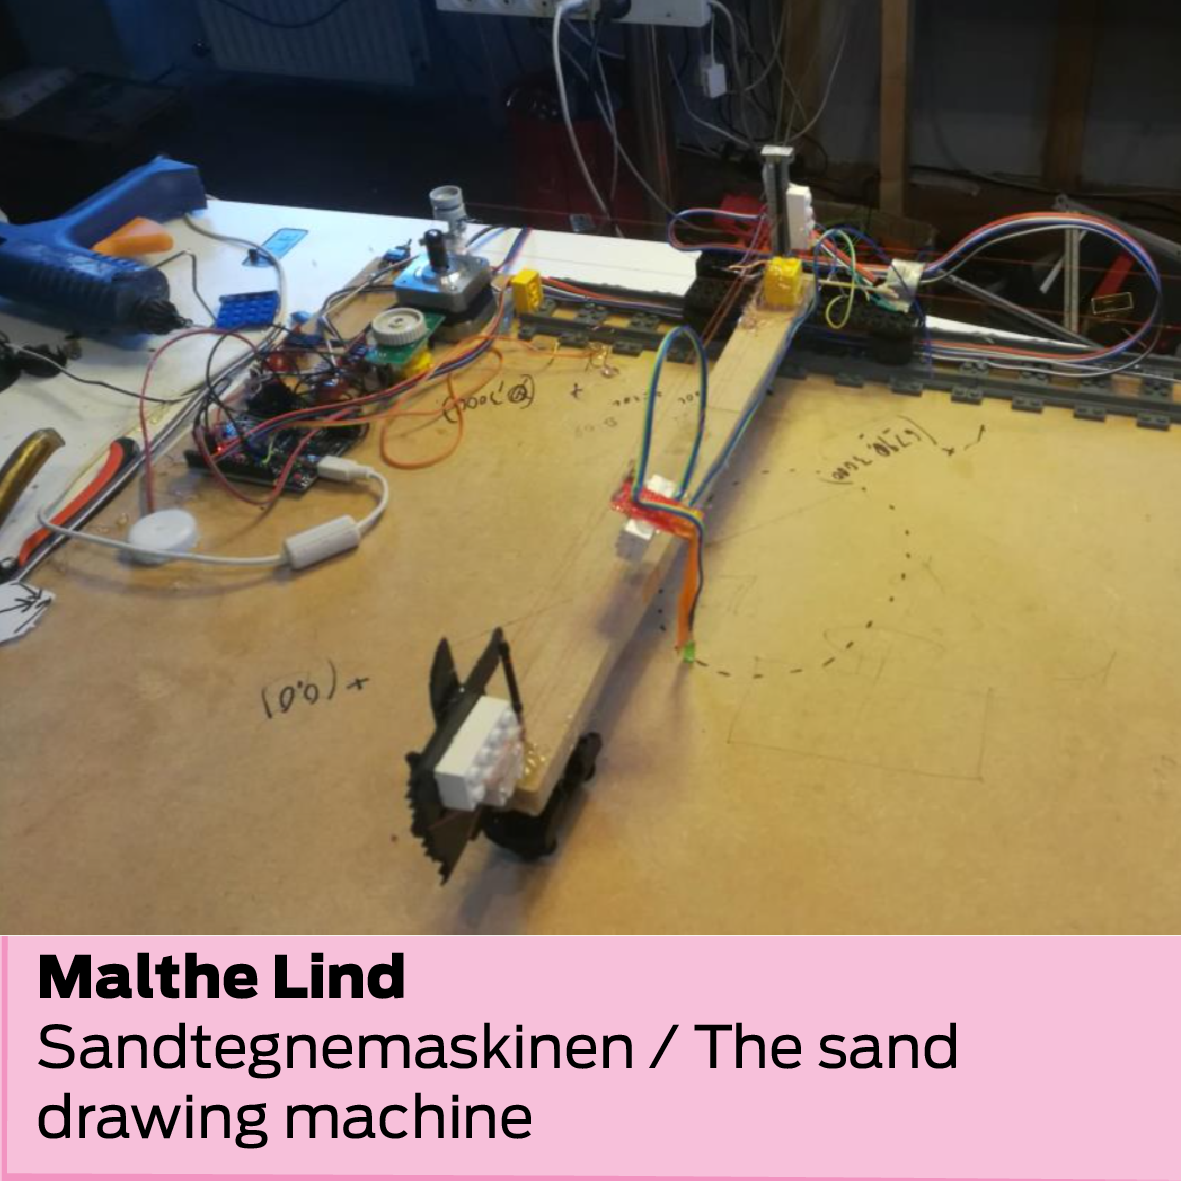 Malthe Lind: Sandtegnemaskinen / The sand drawing machine